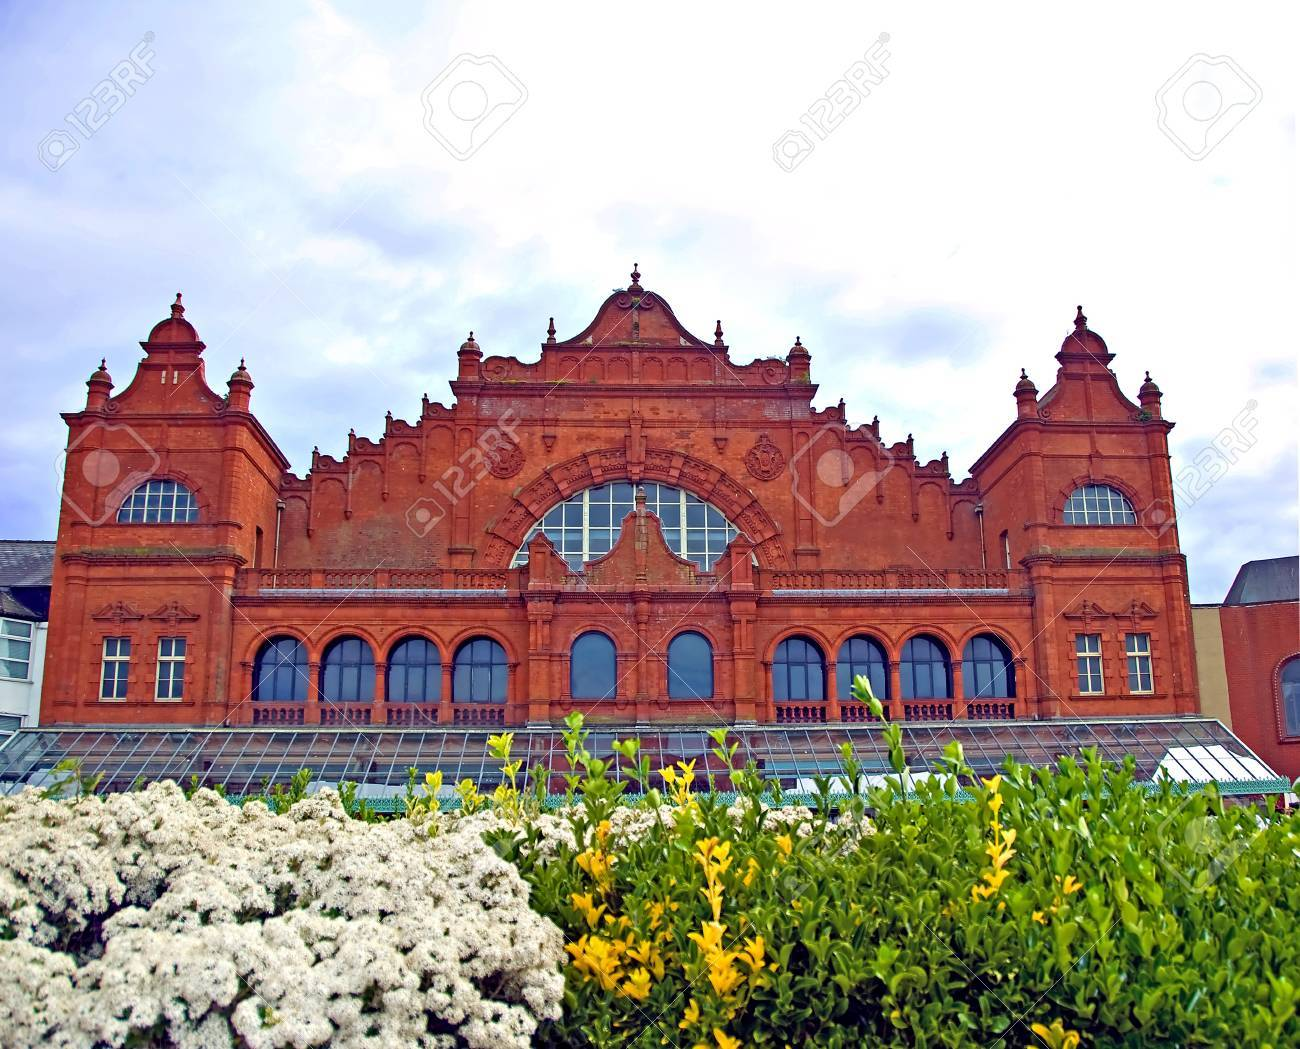 the ornate red brick facade of the winter gardens theatre in